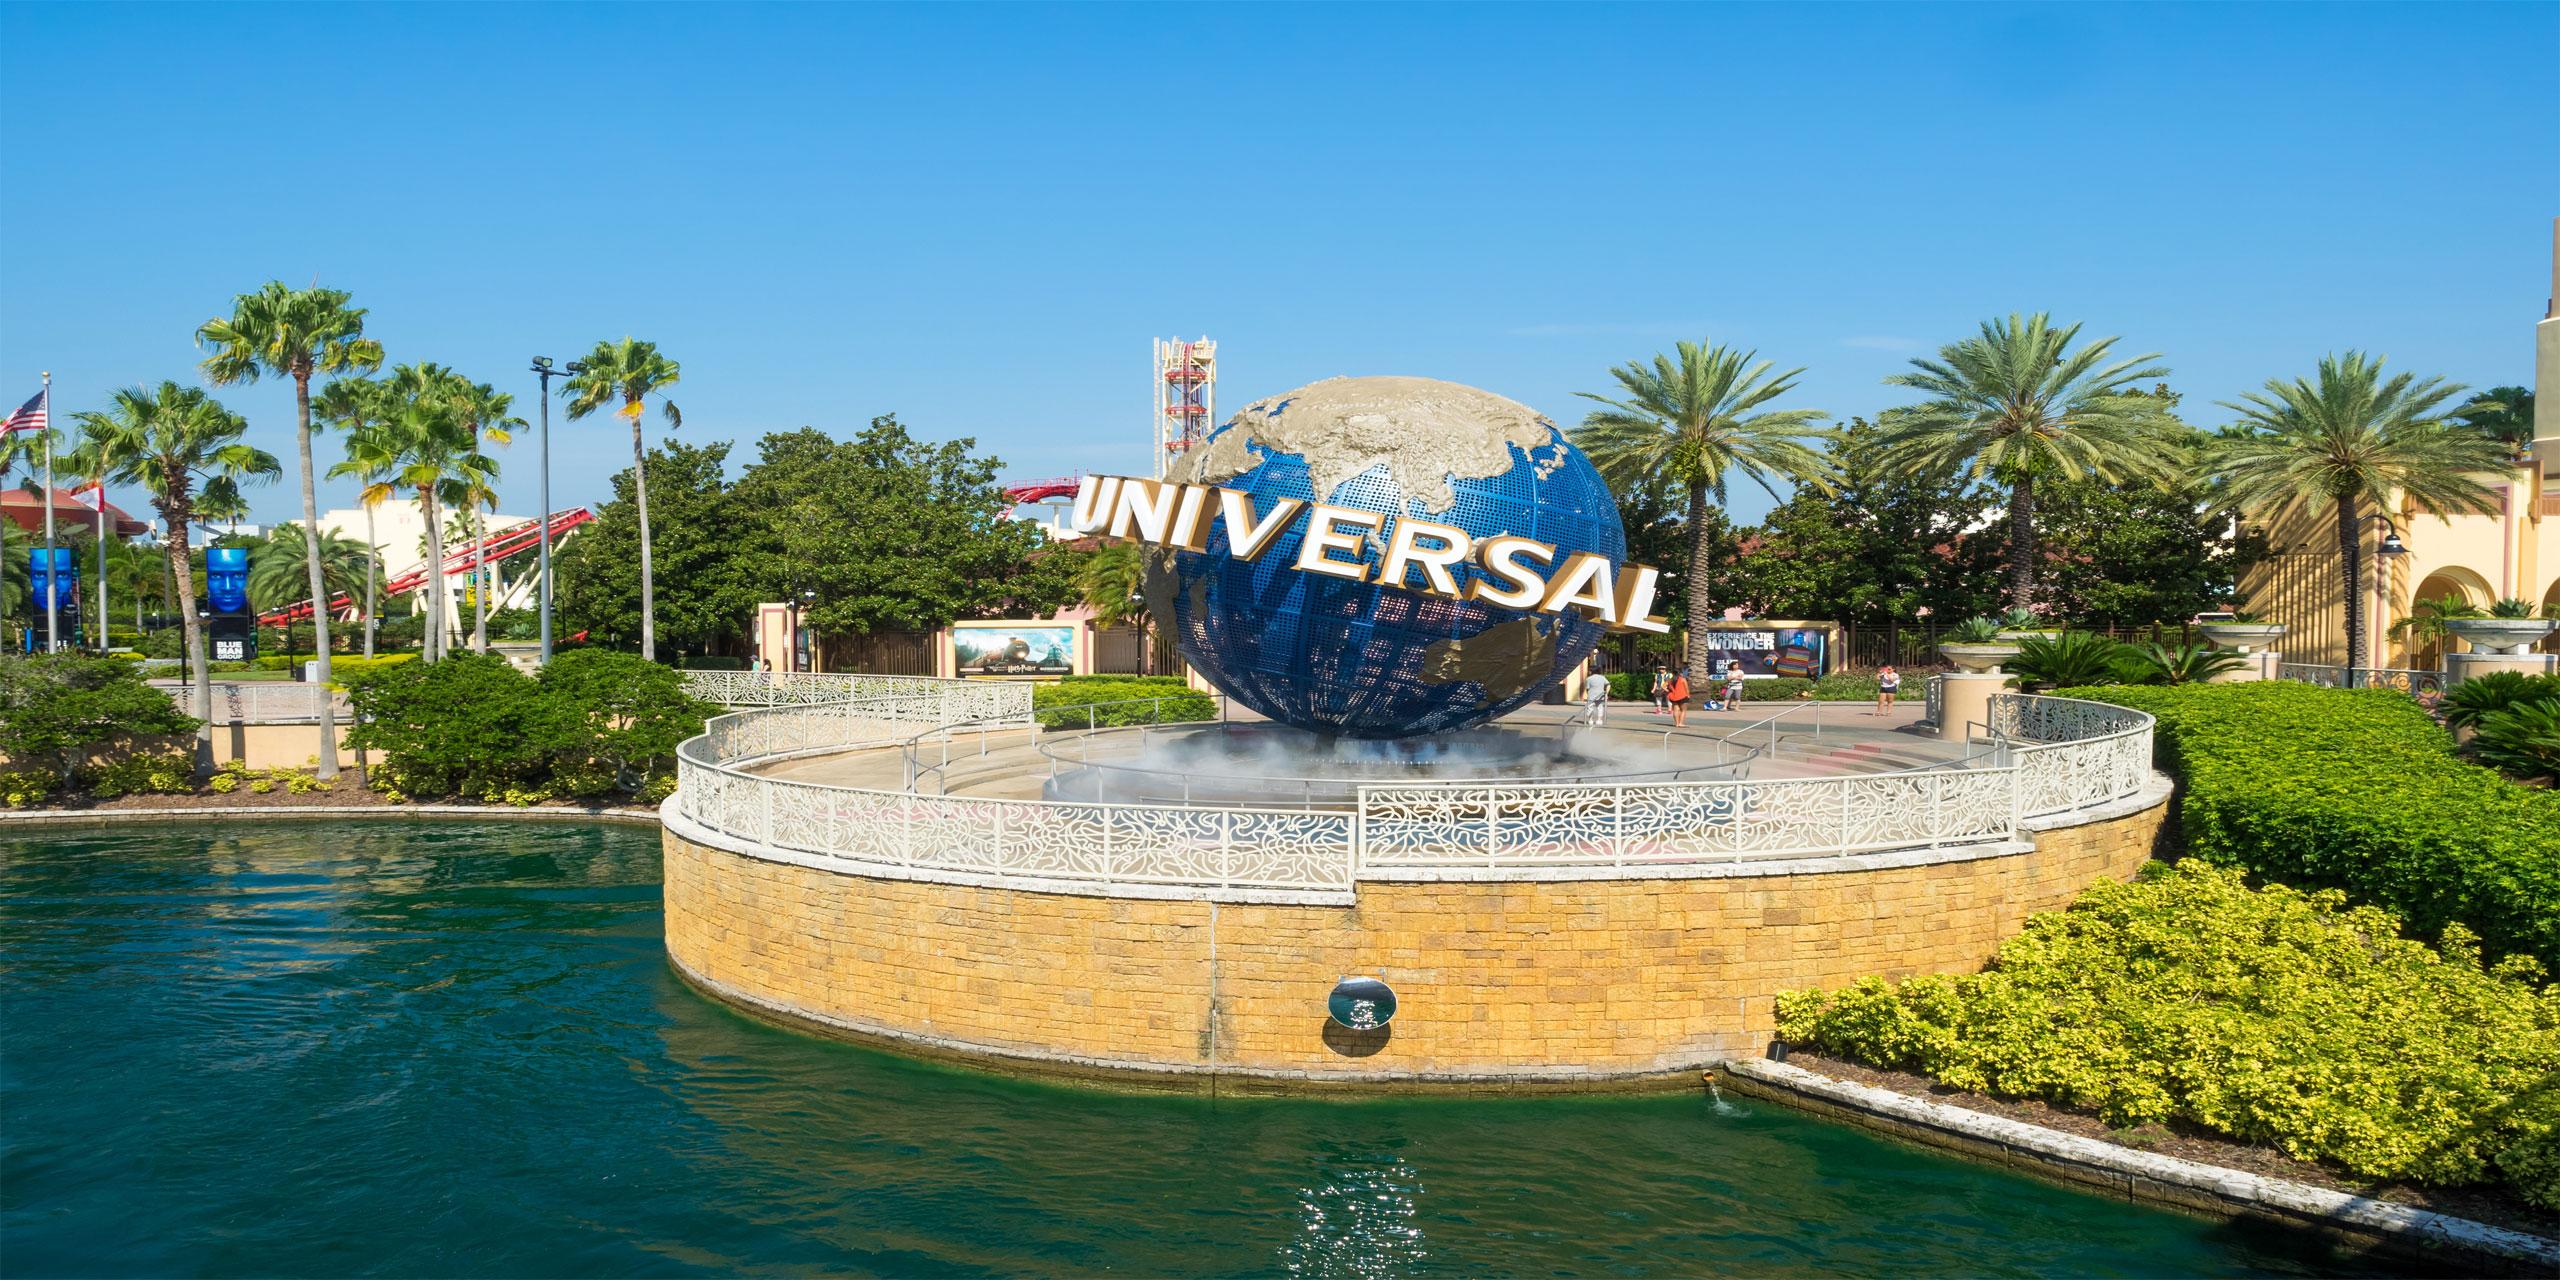 Universal Orlando; Courtesy of Kamira/Shutterstock.com